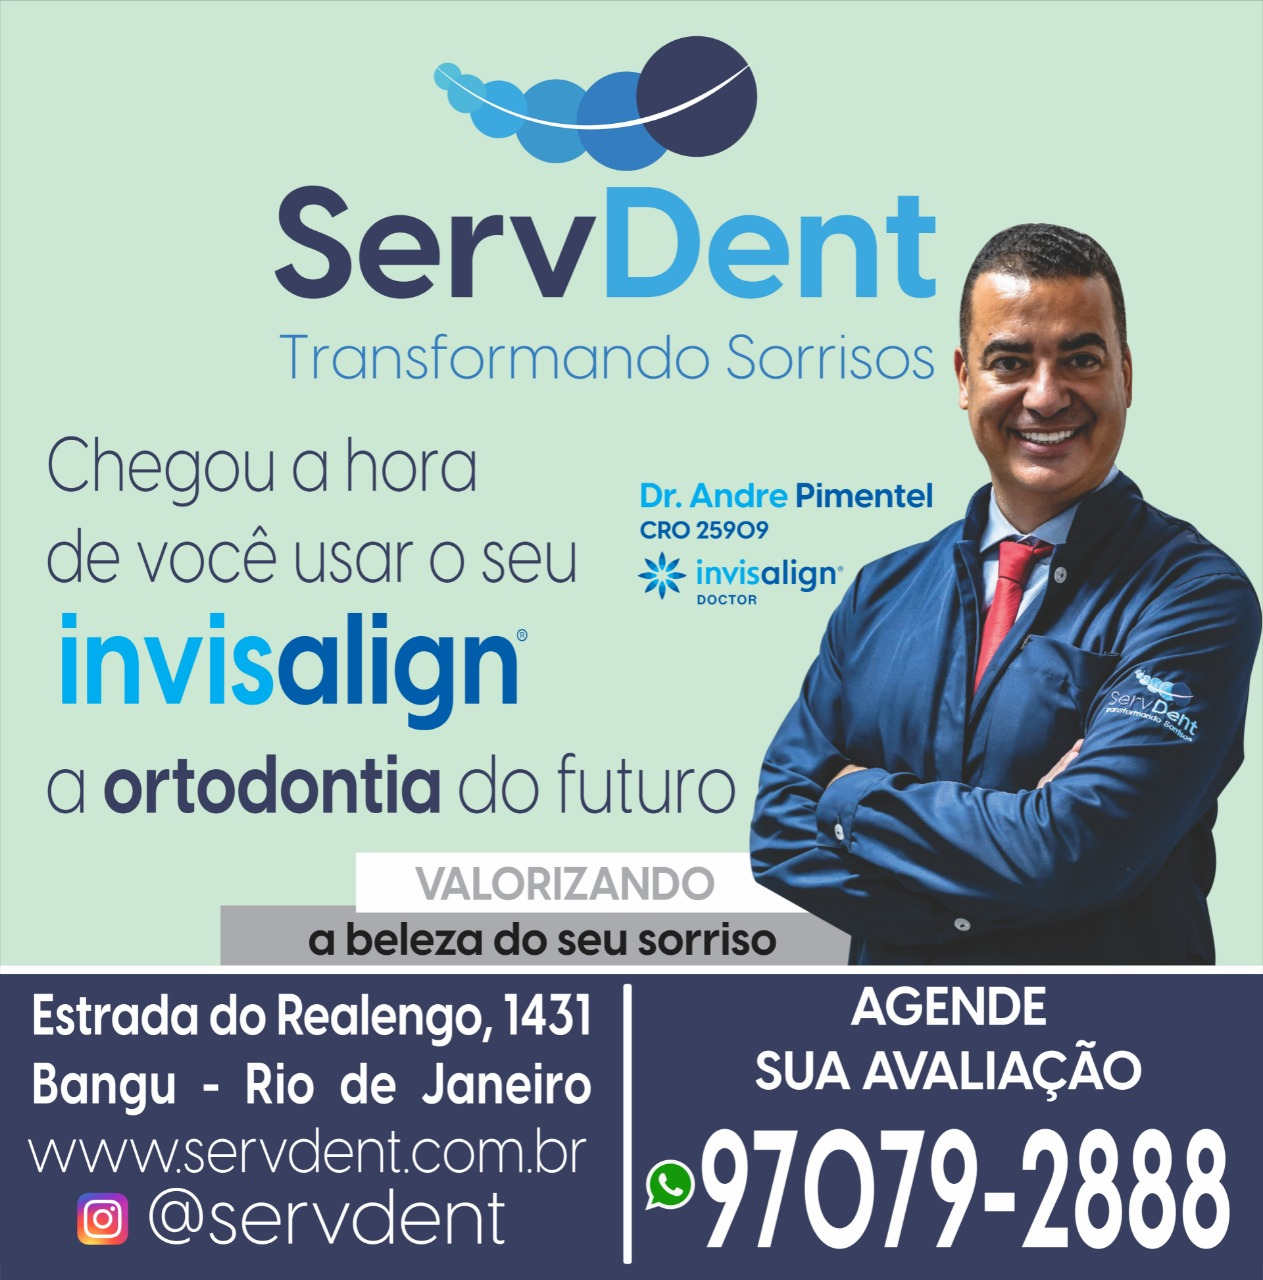 ServDent